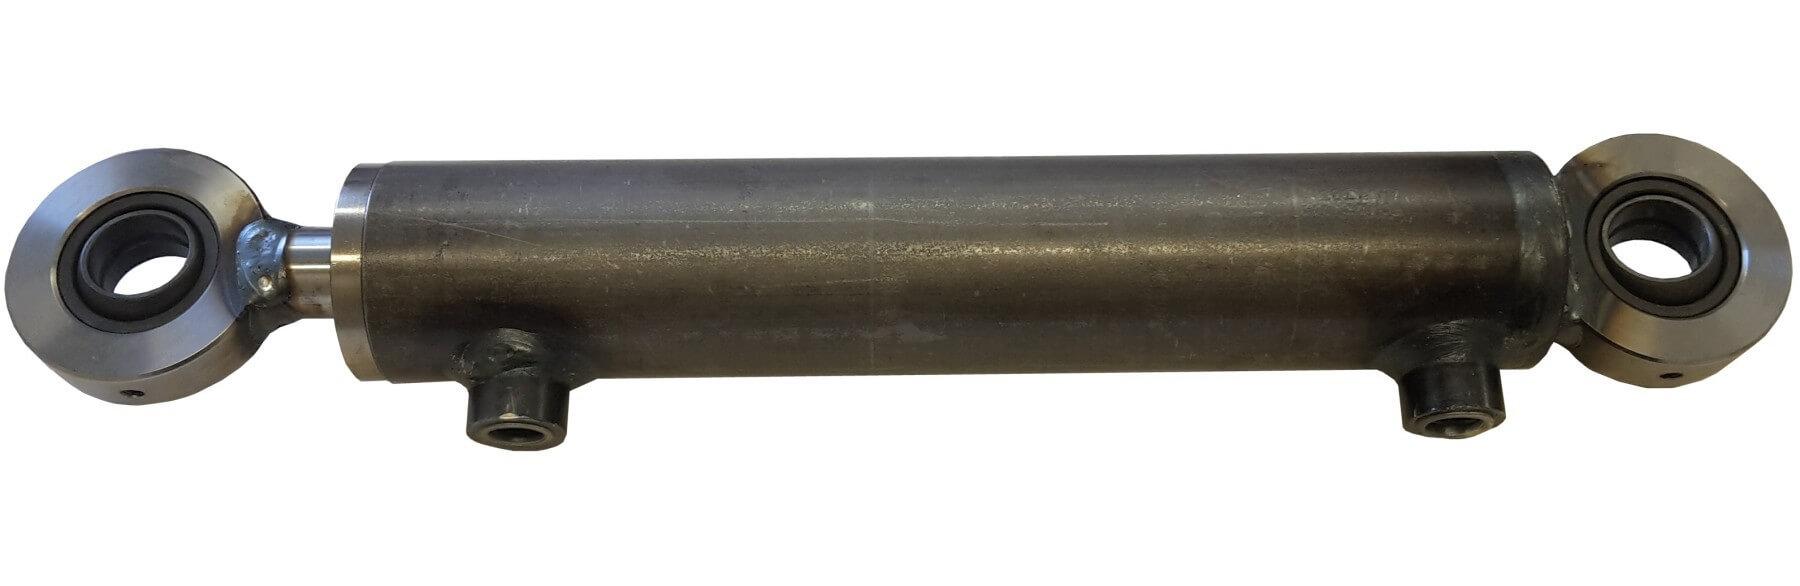 Hydraulisylinteri CL 60. 30. 550 GE